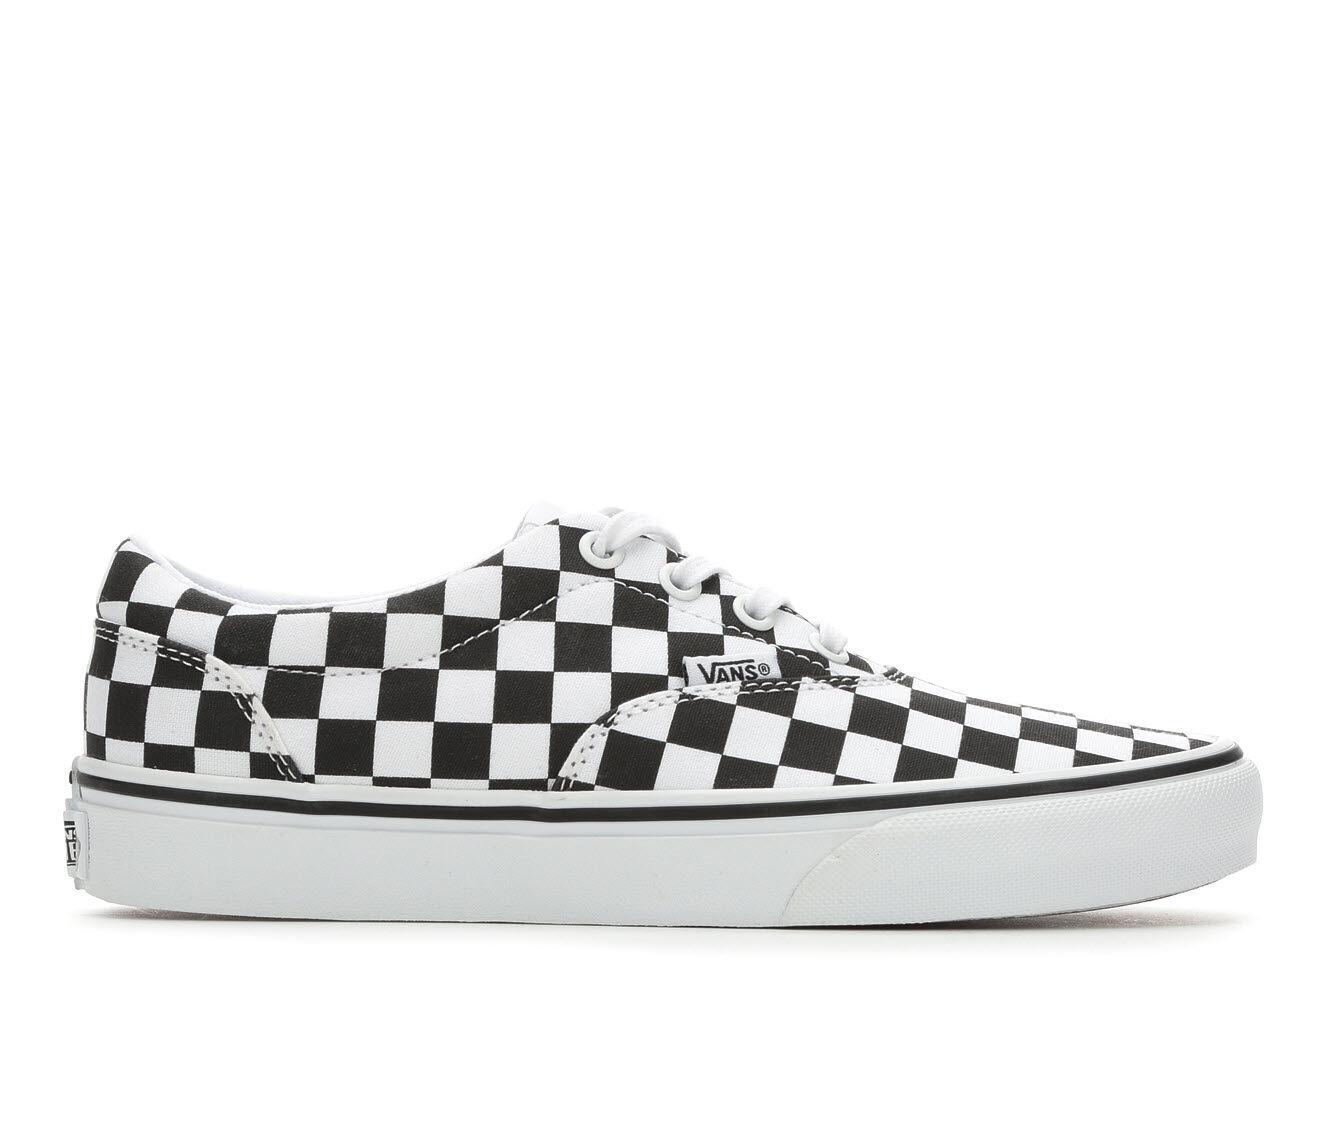 Women's Vans Doheny Skate Shoes Blk/Wht Checker